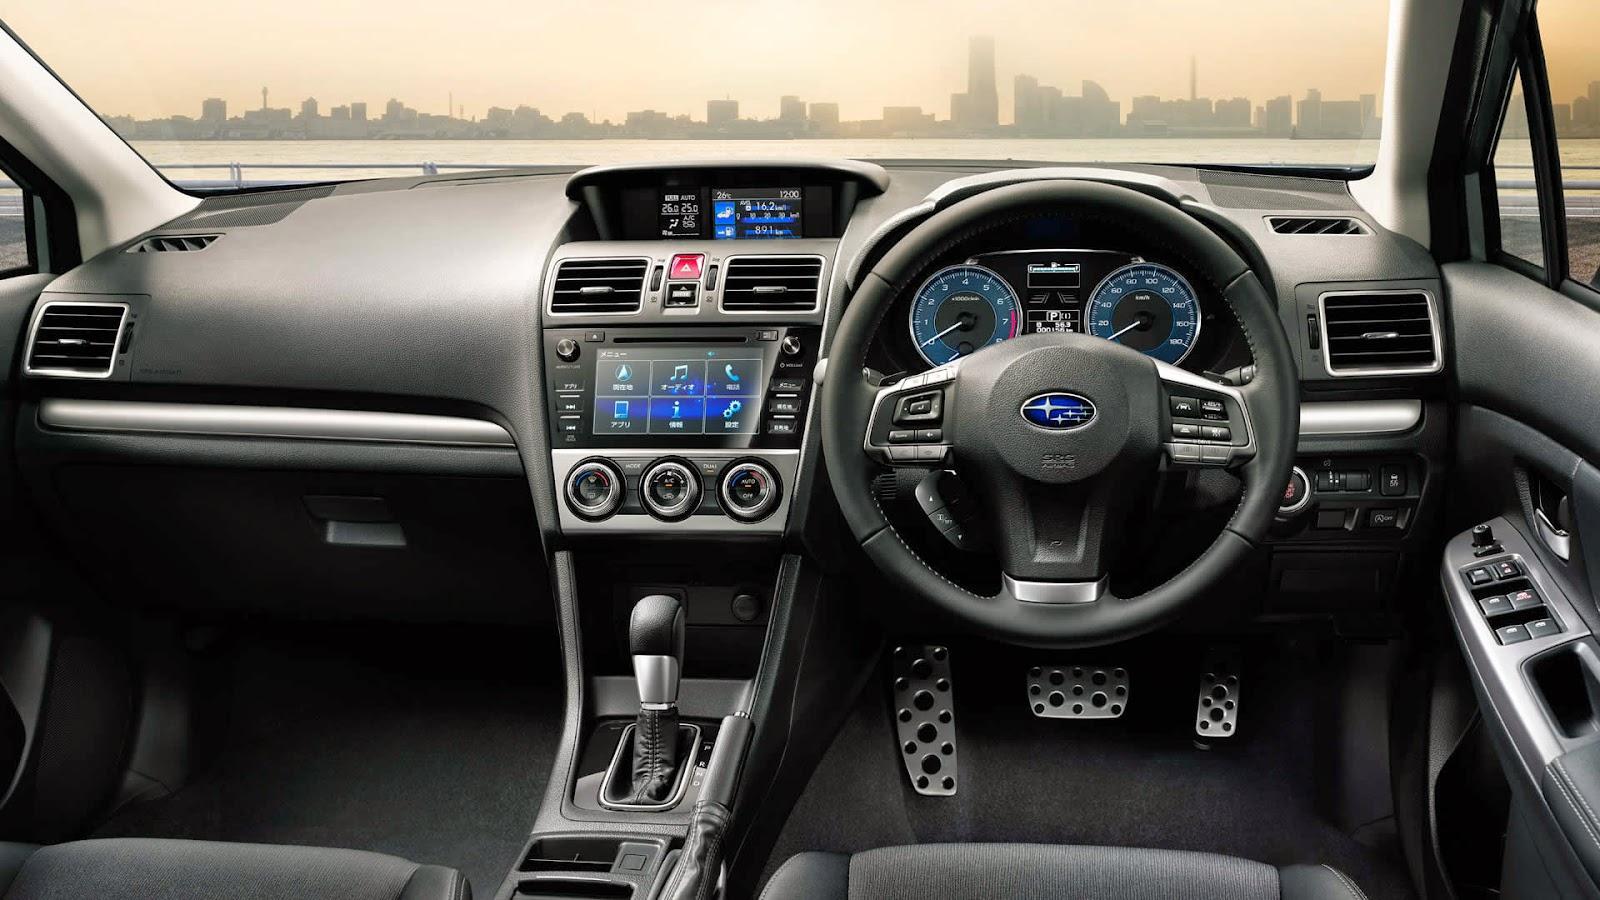 Leopaul 39 S Blog Subaru Impreza Sport And G4 2015 Minor Change